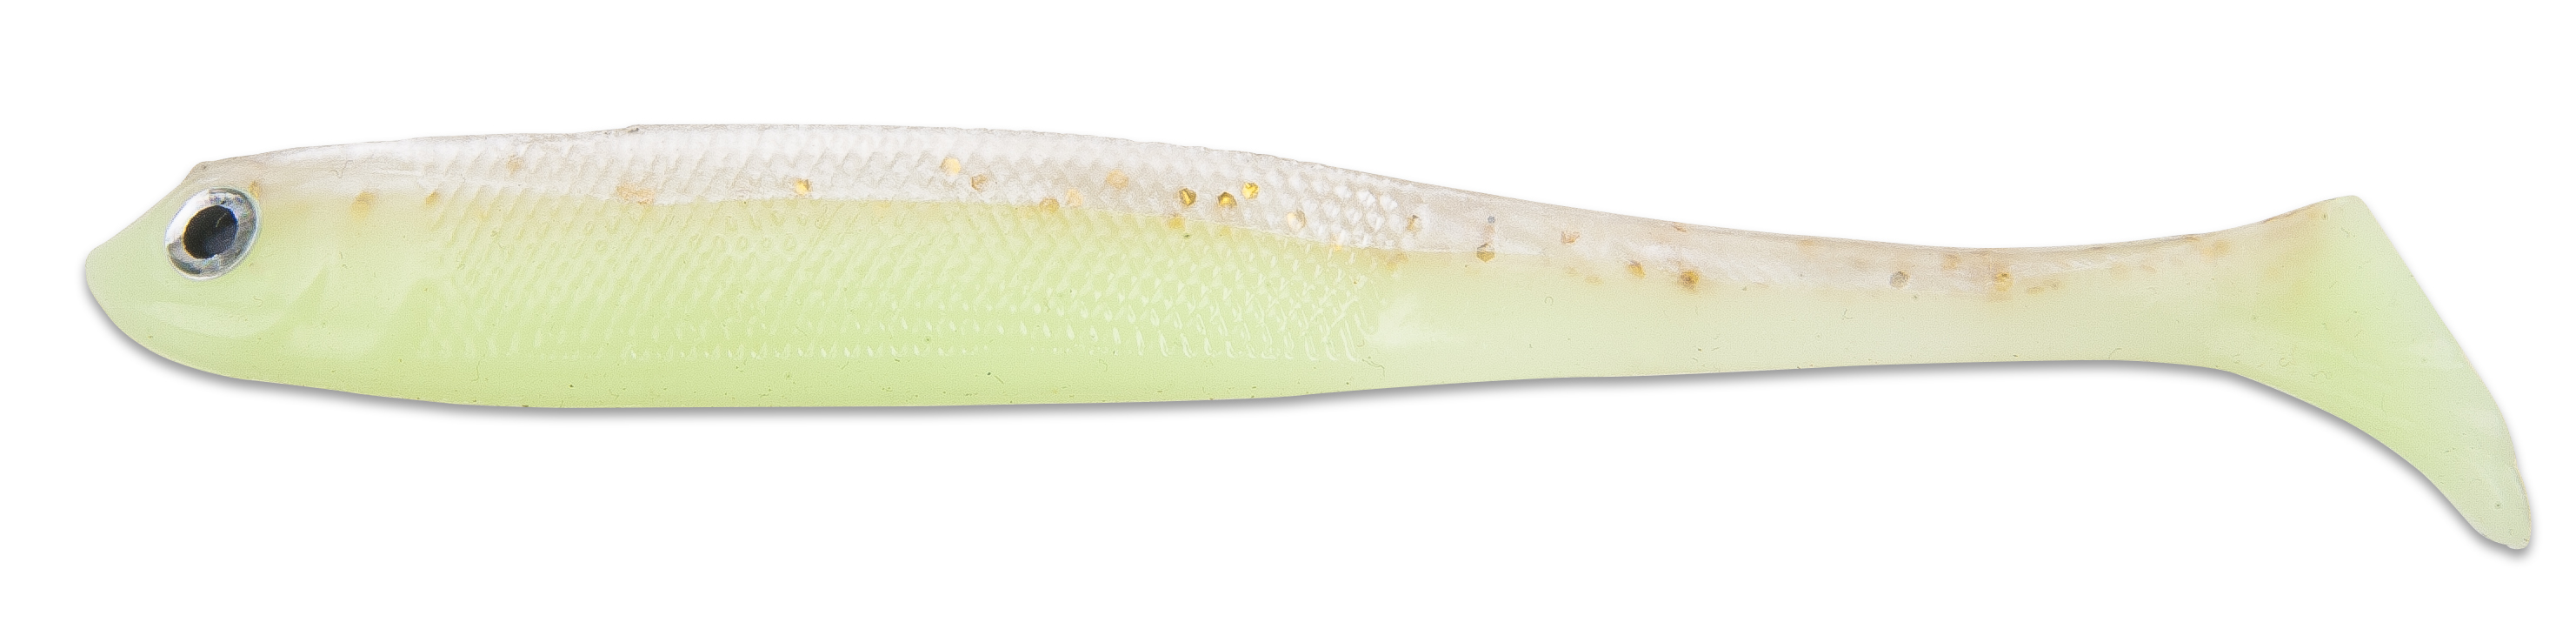 Iron Claw gumová nástraha Slim Jim 7 cm Vzor LU, 3 ks